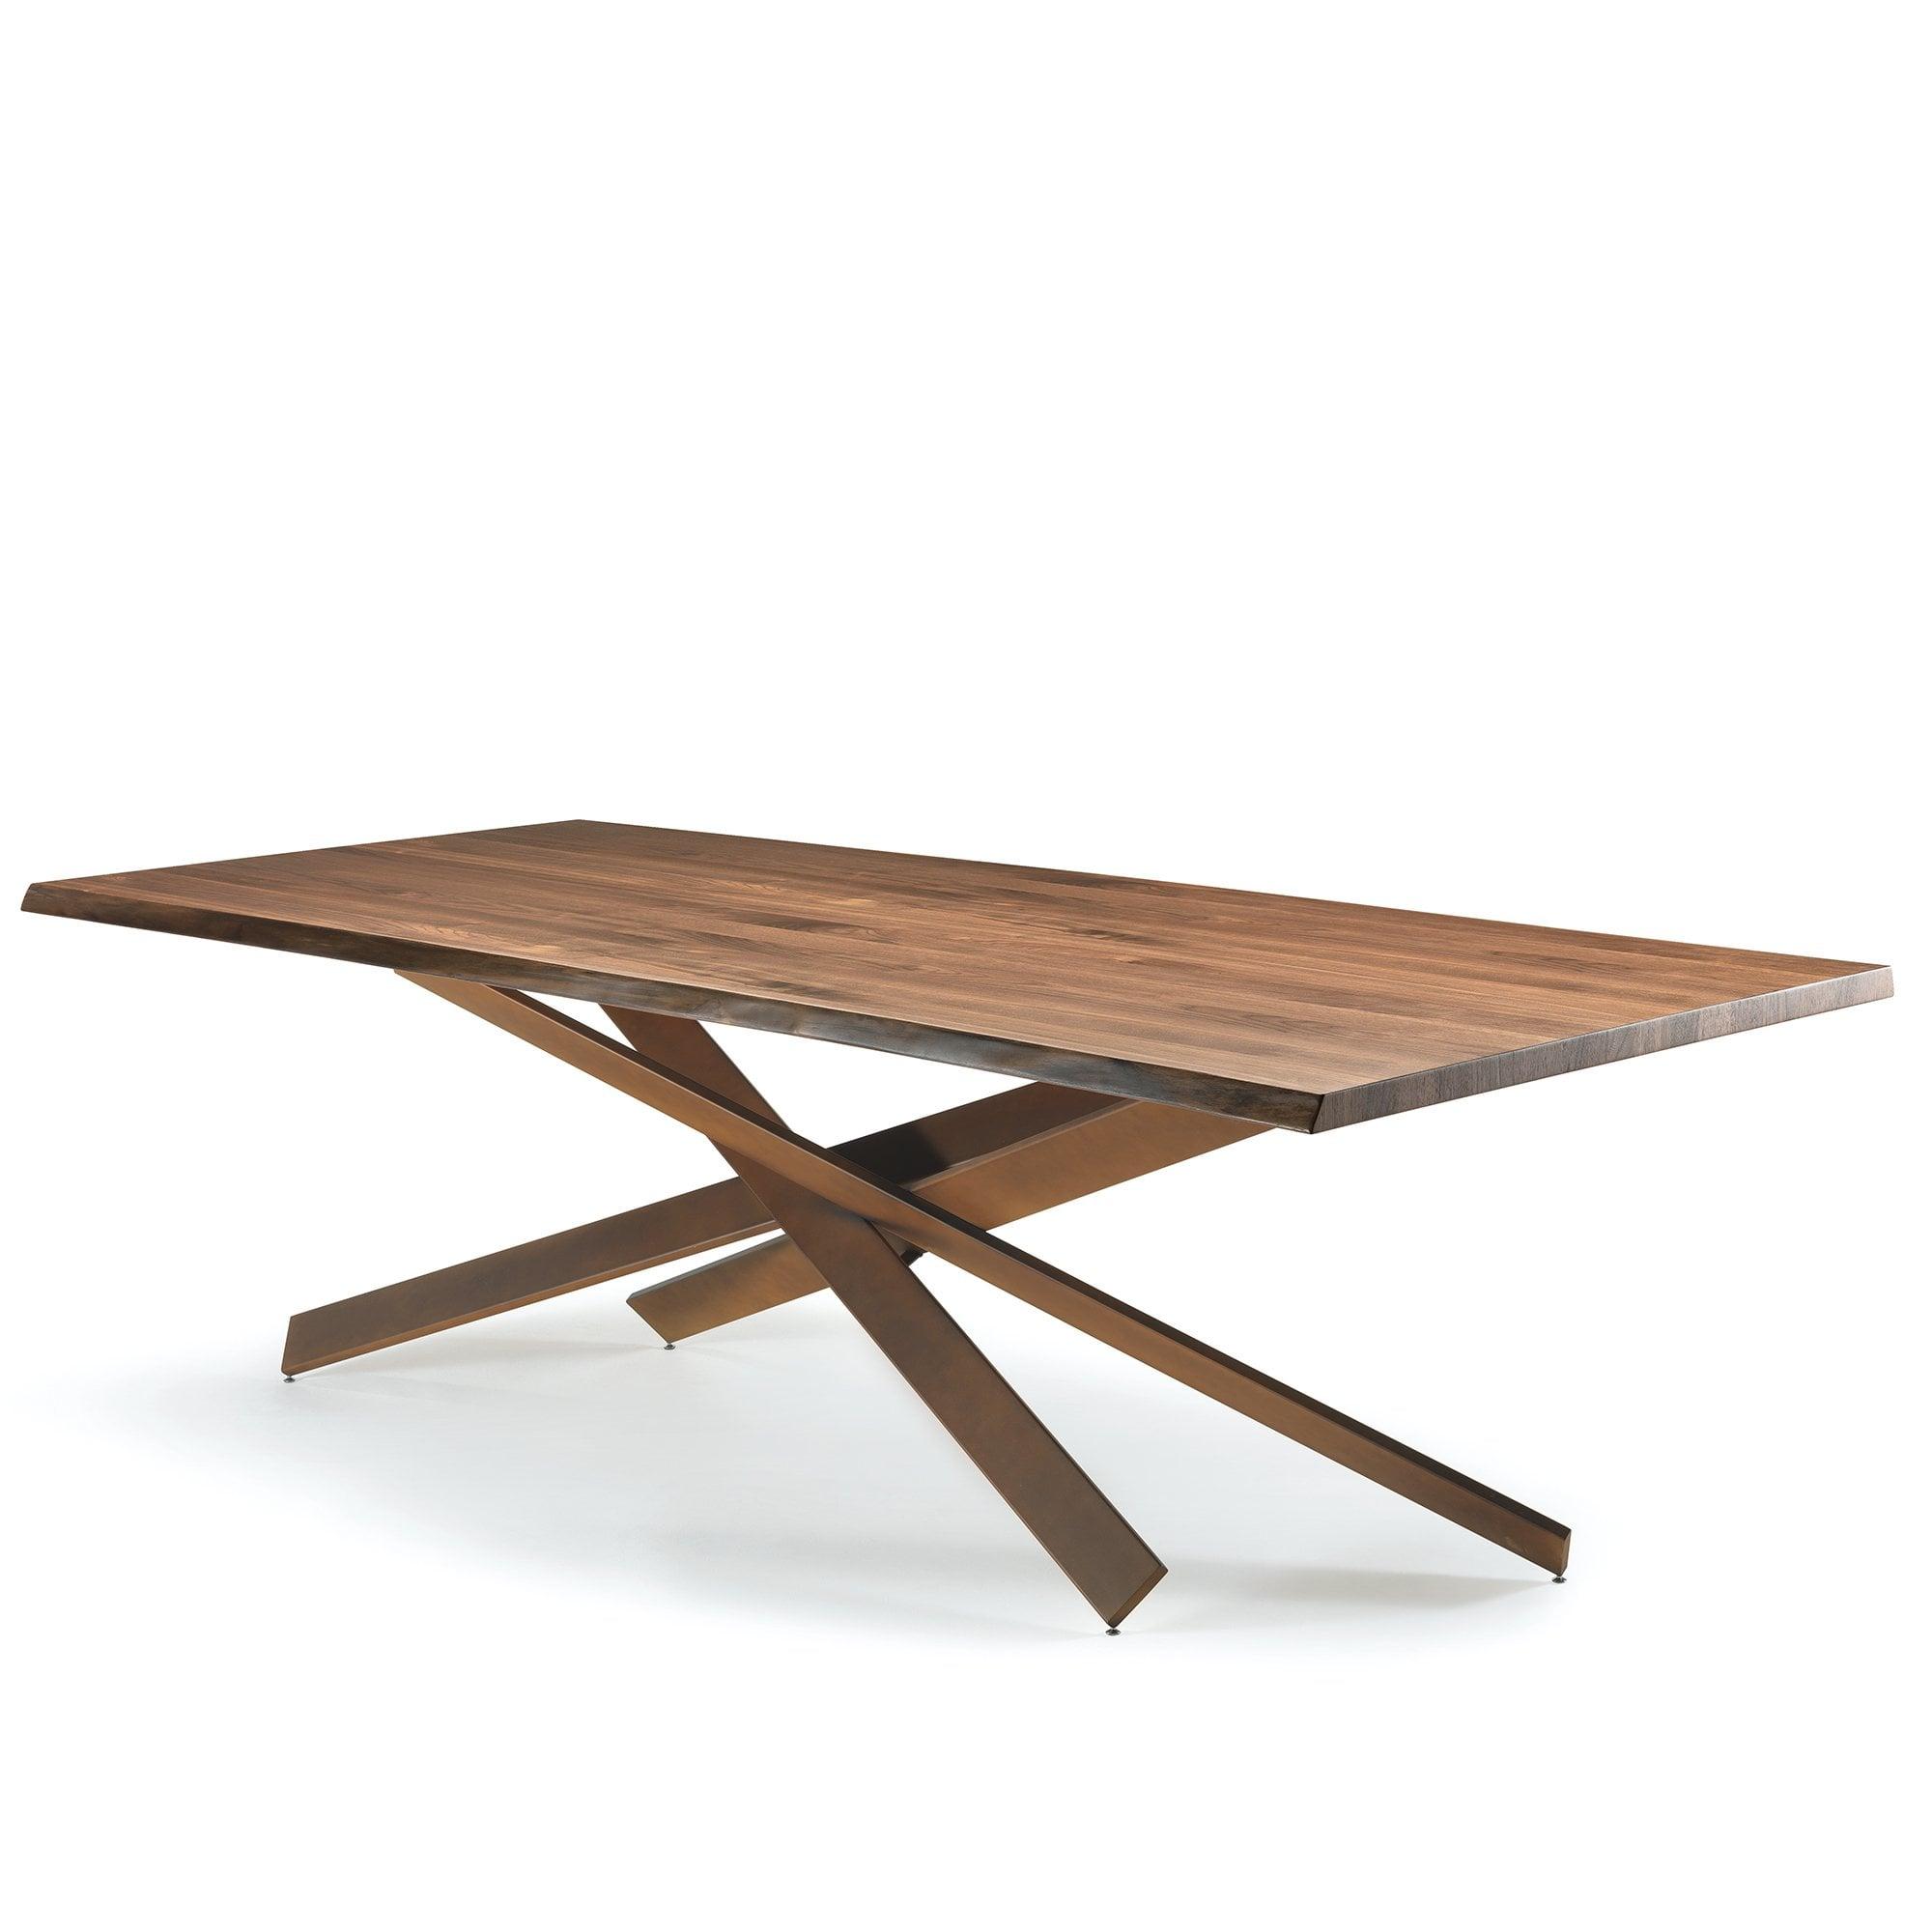 Reflex Mikado Dining Table - Walnut and Brass